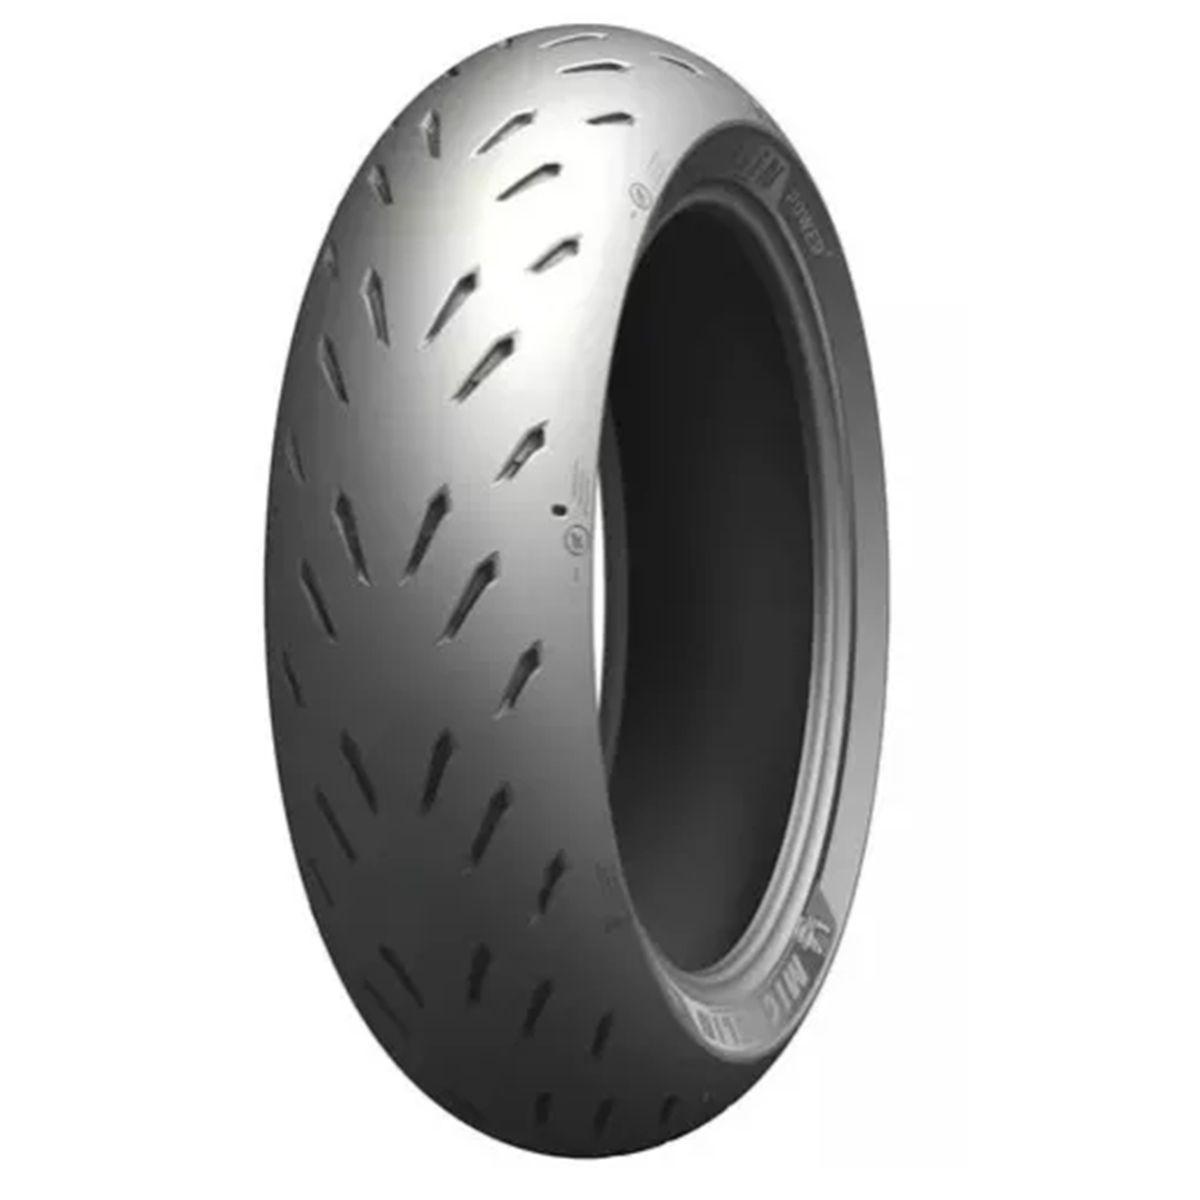 Pneu para Moto Michelin Power RS Traseiro TL 150/60 ZR17 (66W)